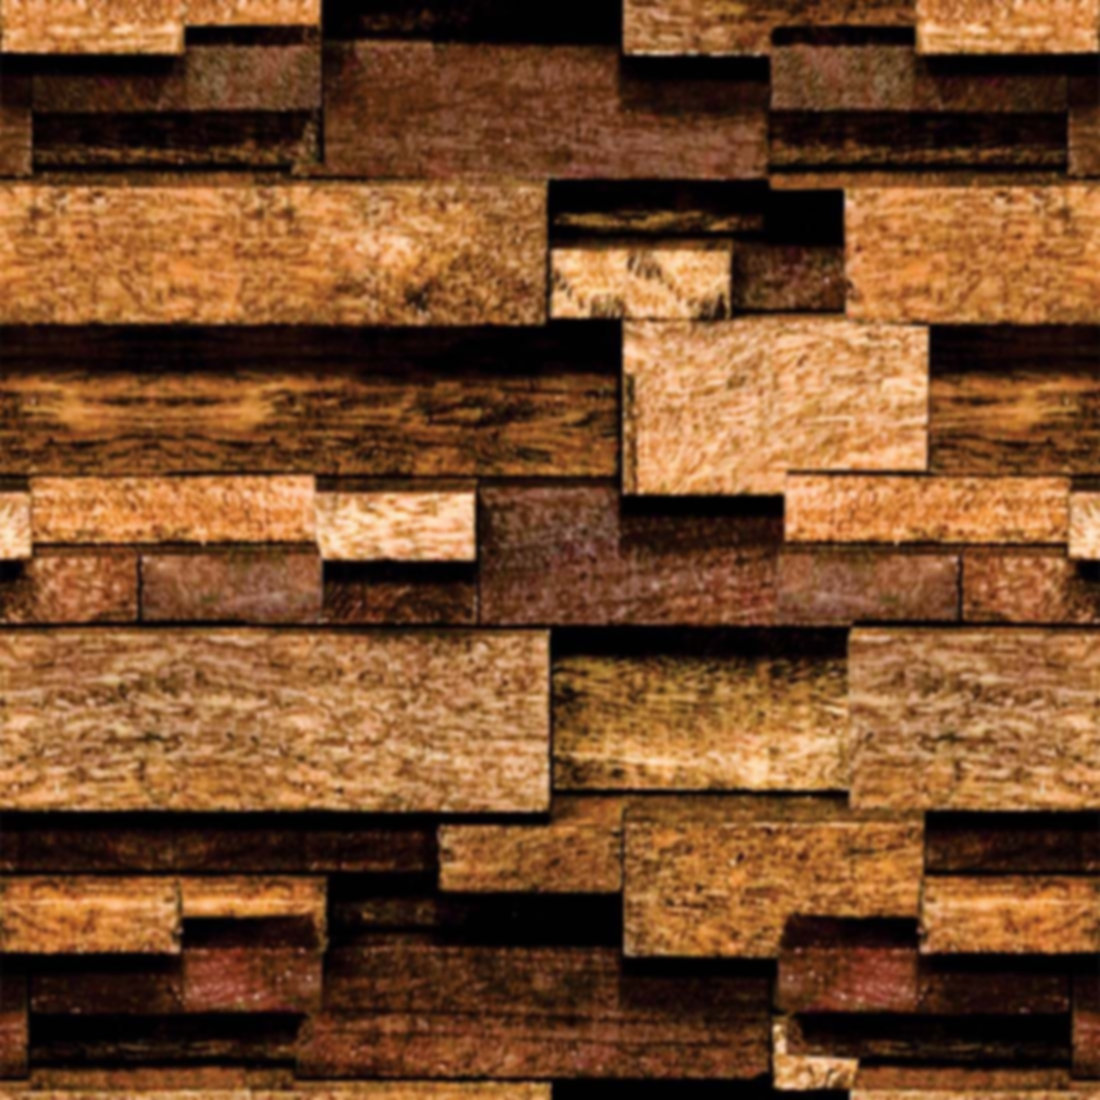 papel-de-parede-madeira-tabuas-3d-adesiv